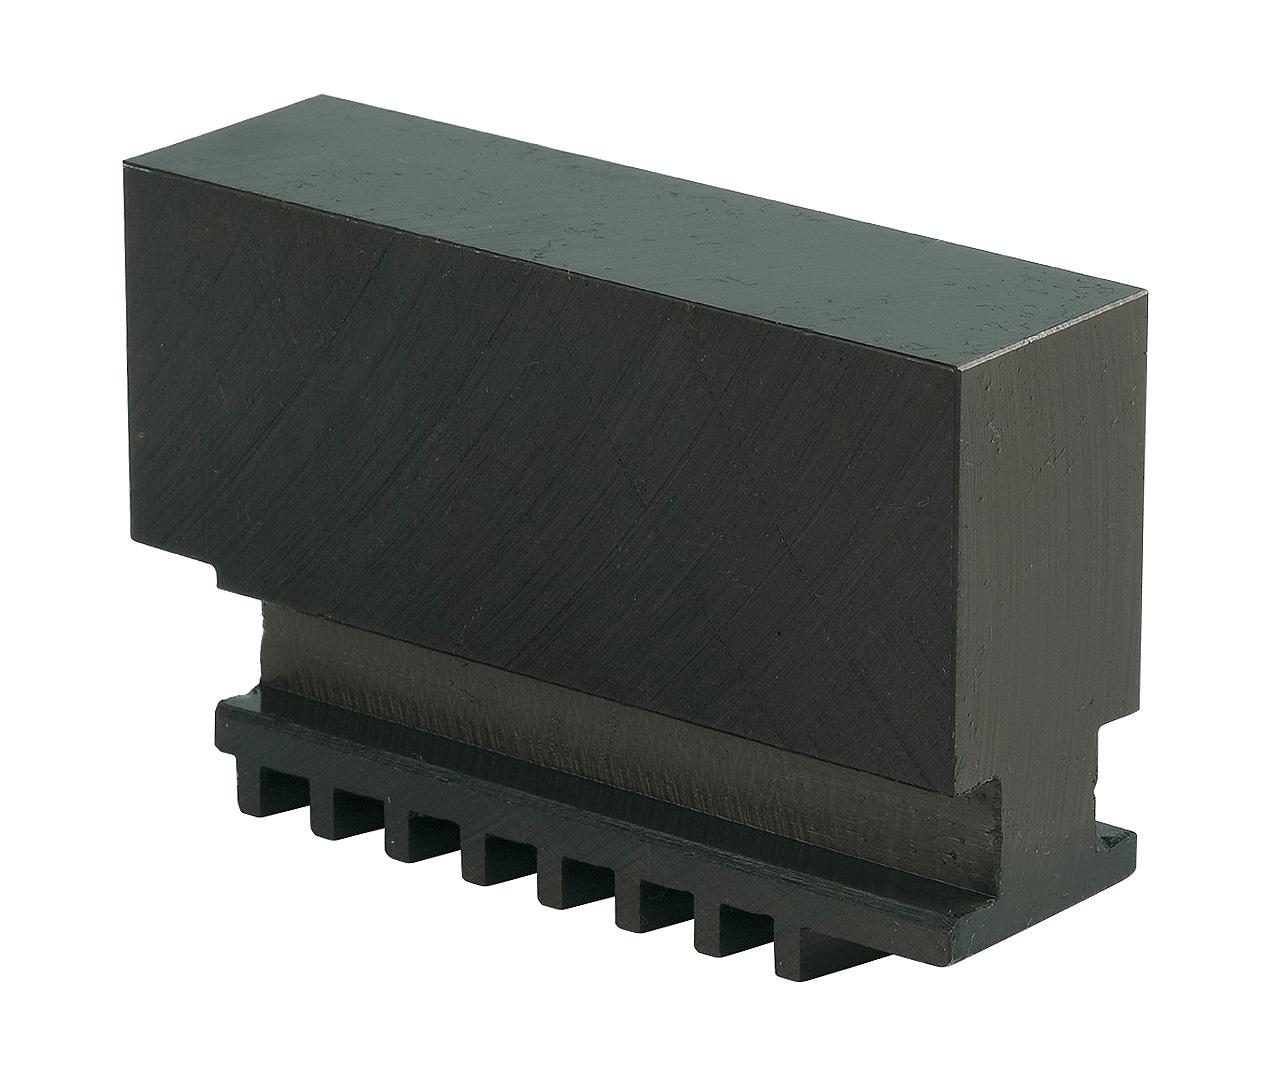 Szczęki jednolite miękkie - komplet SJ-PS4-160 BERNARDO